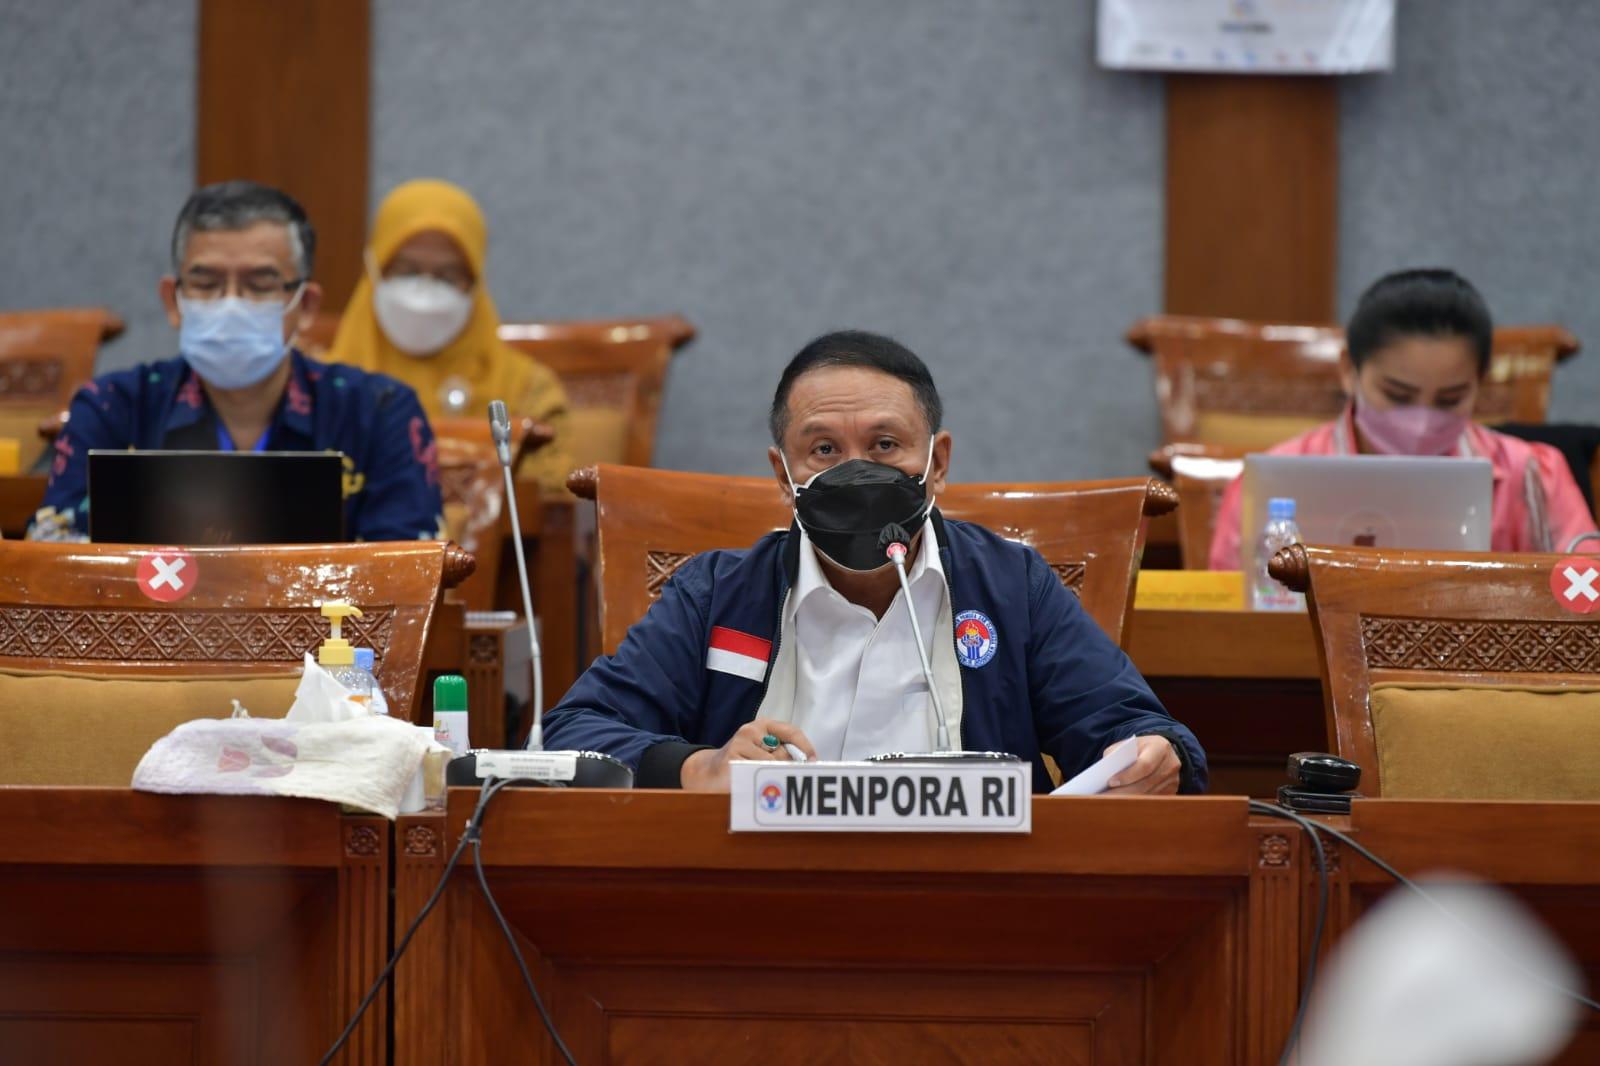 Komisi X DPR RI Setujui Pagu Anggaran Sementara Kemenpora Tahun Anggaran 2022